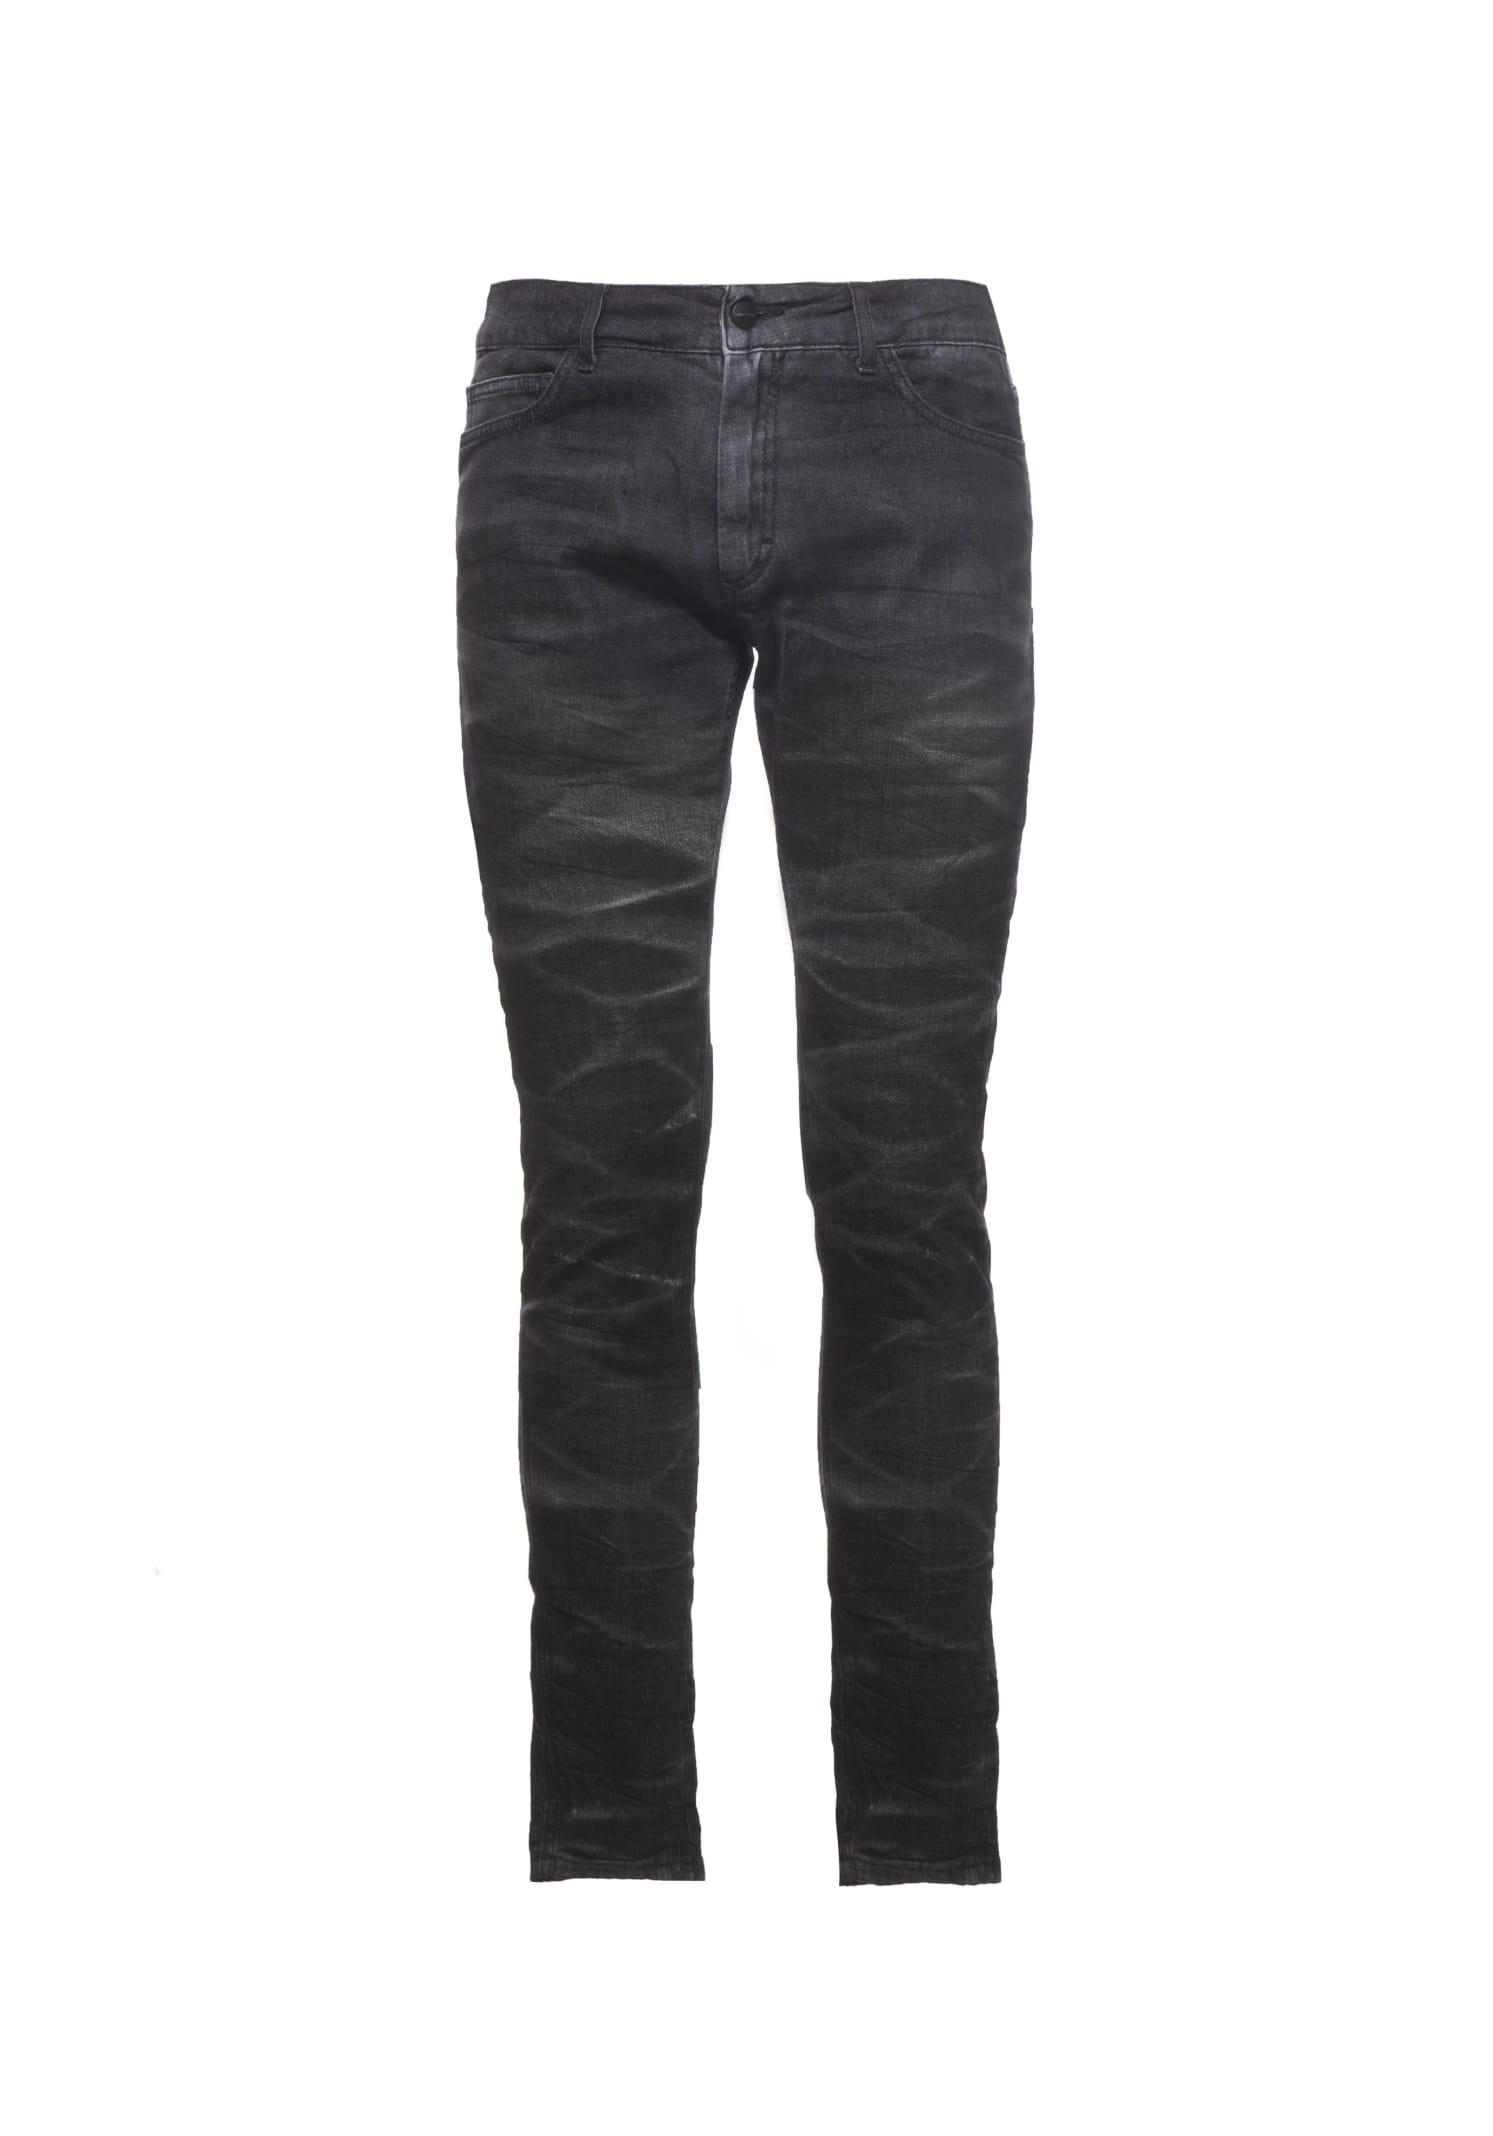 Jeans Denim Marble Black